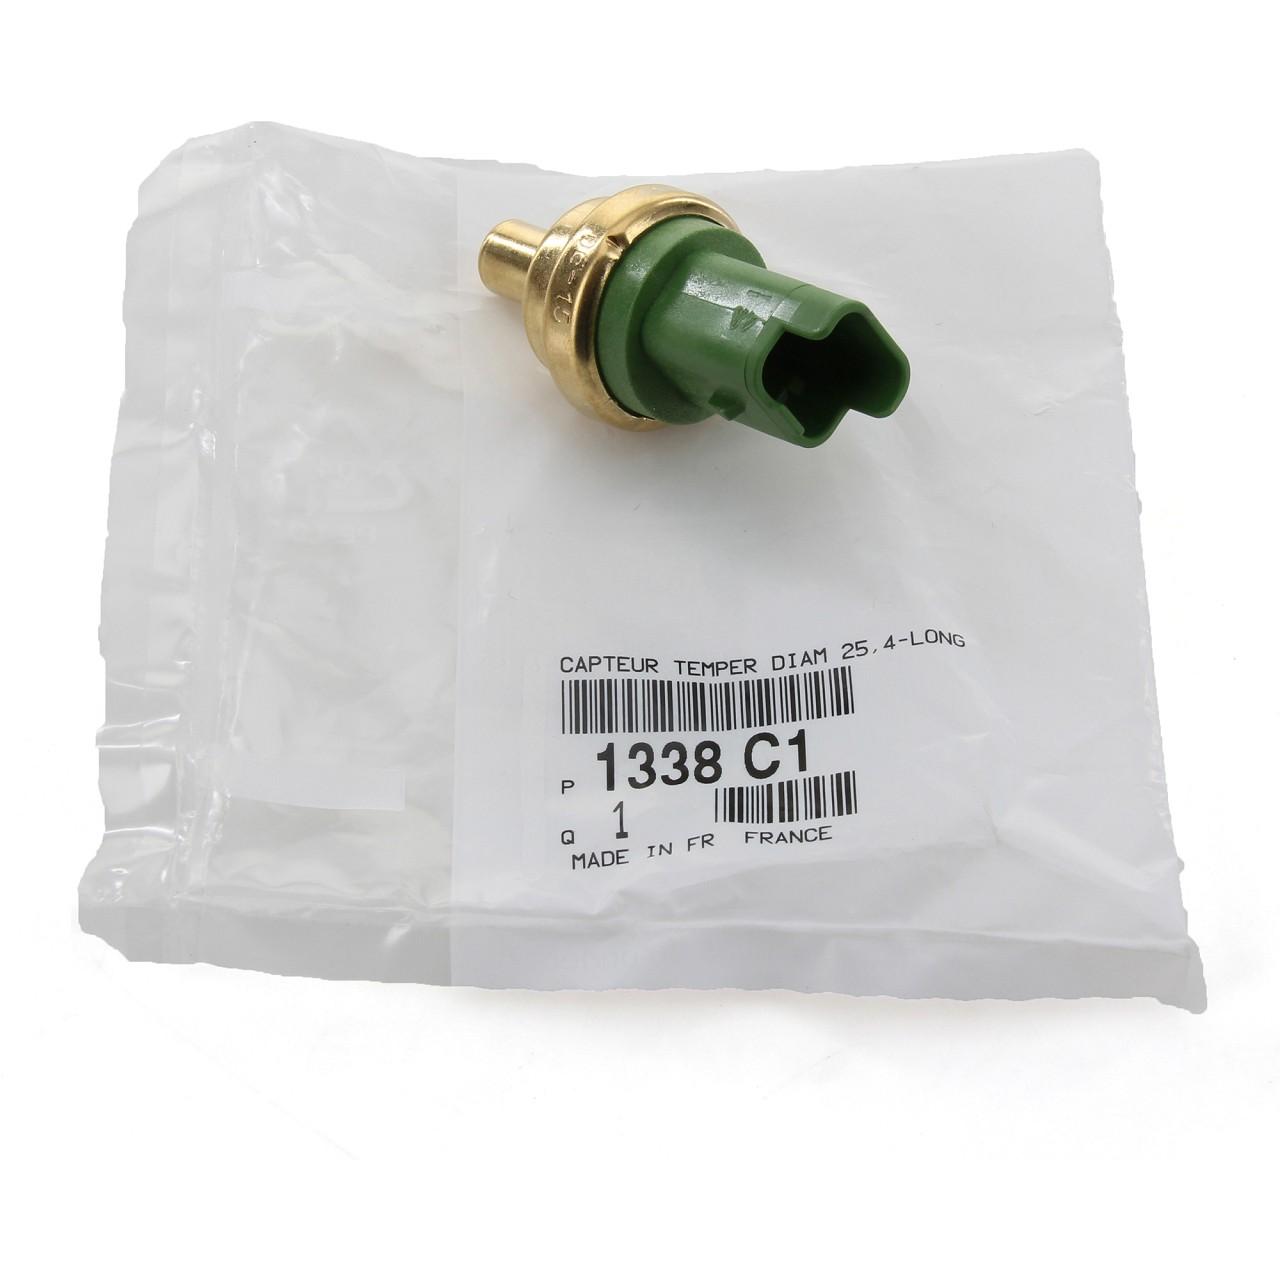 ORIGINAL Citroen Peugeot Temperaturgeber Kühlmitteltemperatursensor 1338.C1